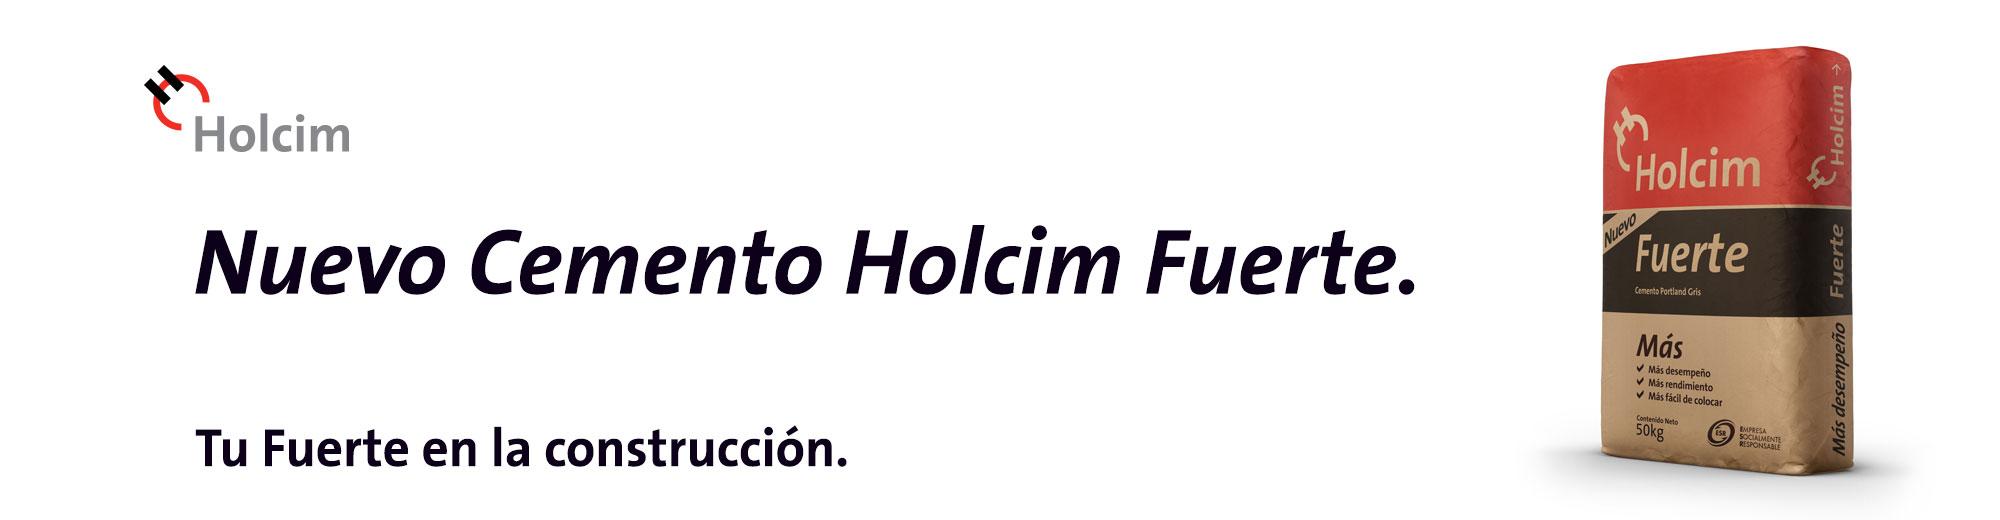 holcim-ferrolaminas-banner-2000x520px